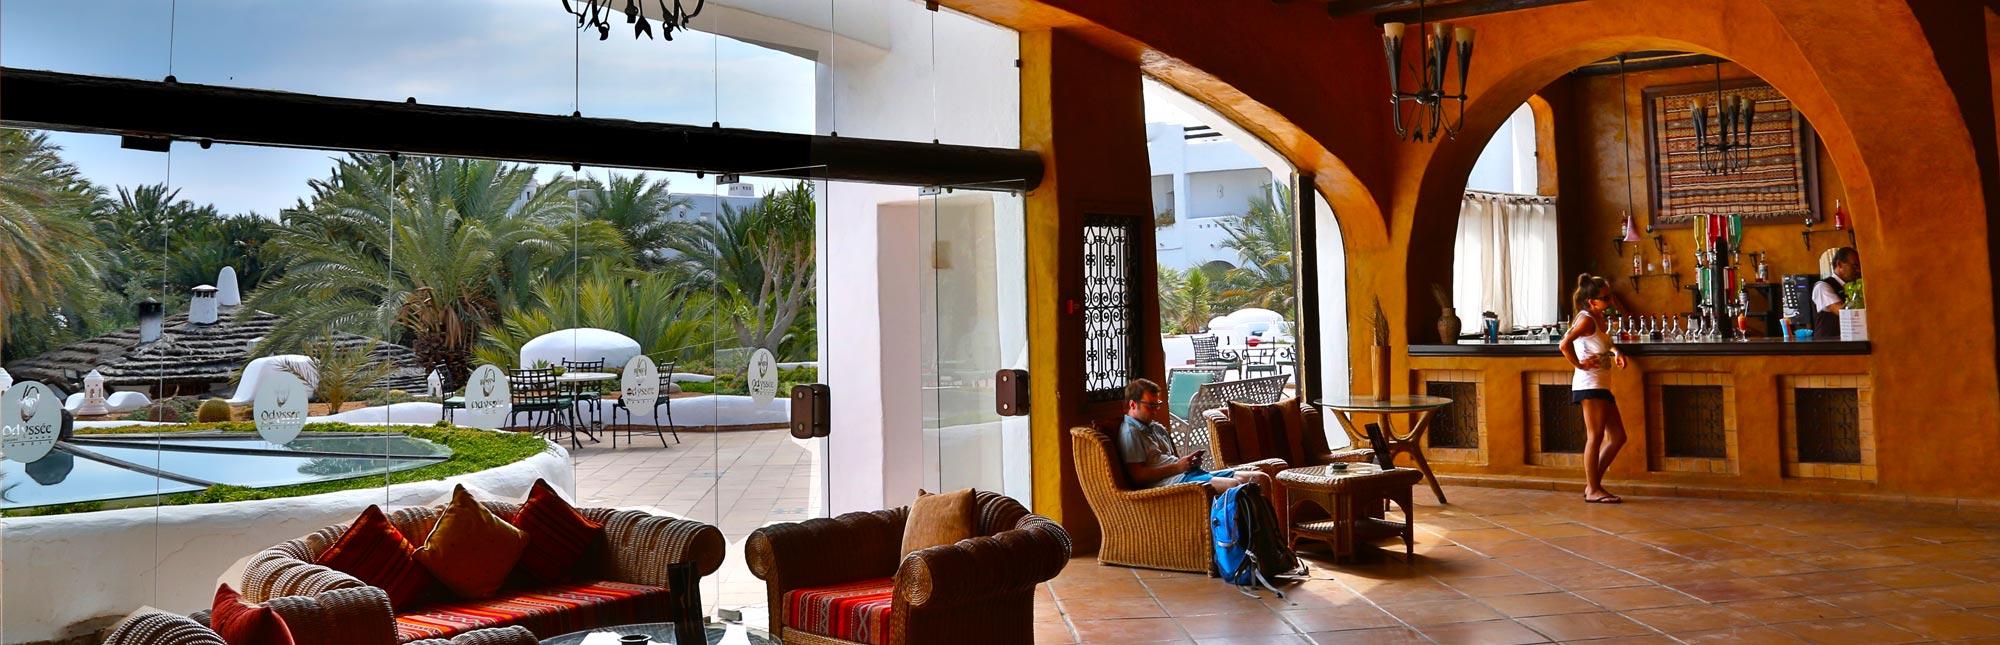 Hotel Odyssee Resort Thalasso Spa Home